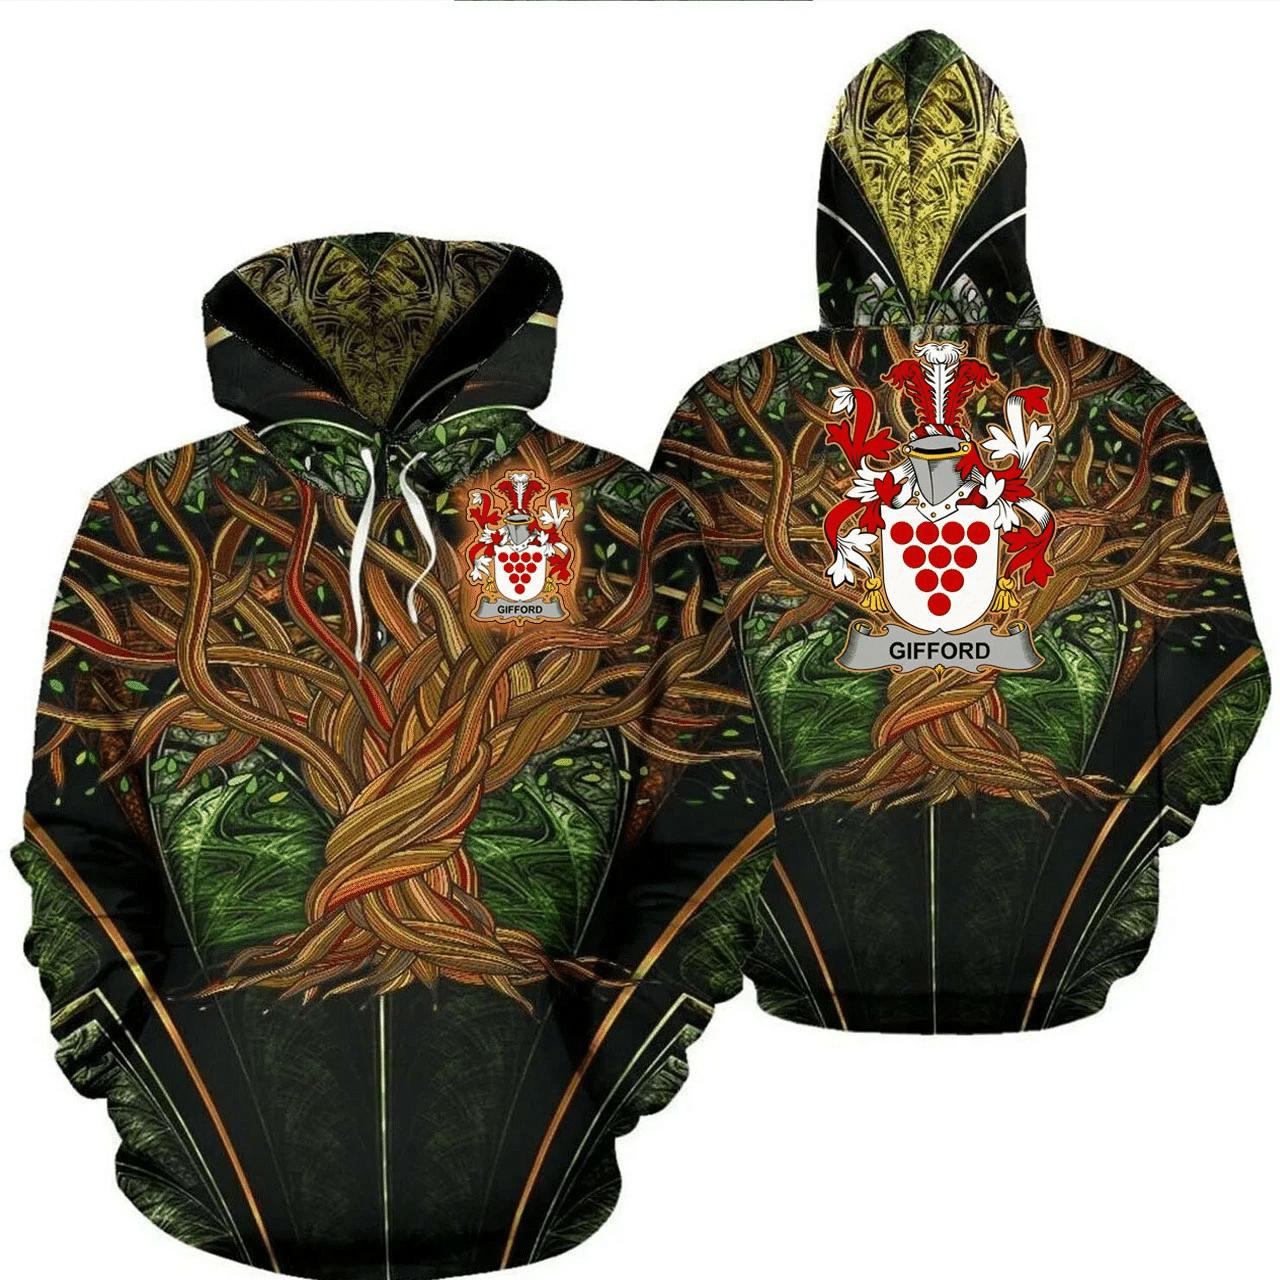 1stIreland Ireland Hoodie - Gifford Irish Family Crest Hoodie - Tree Of Life A7